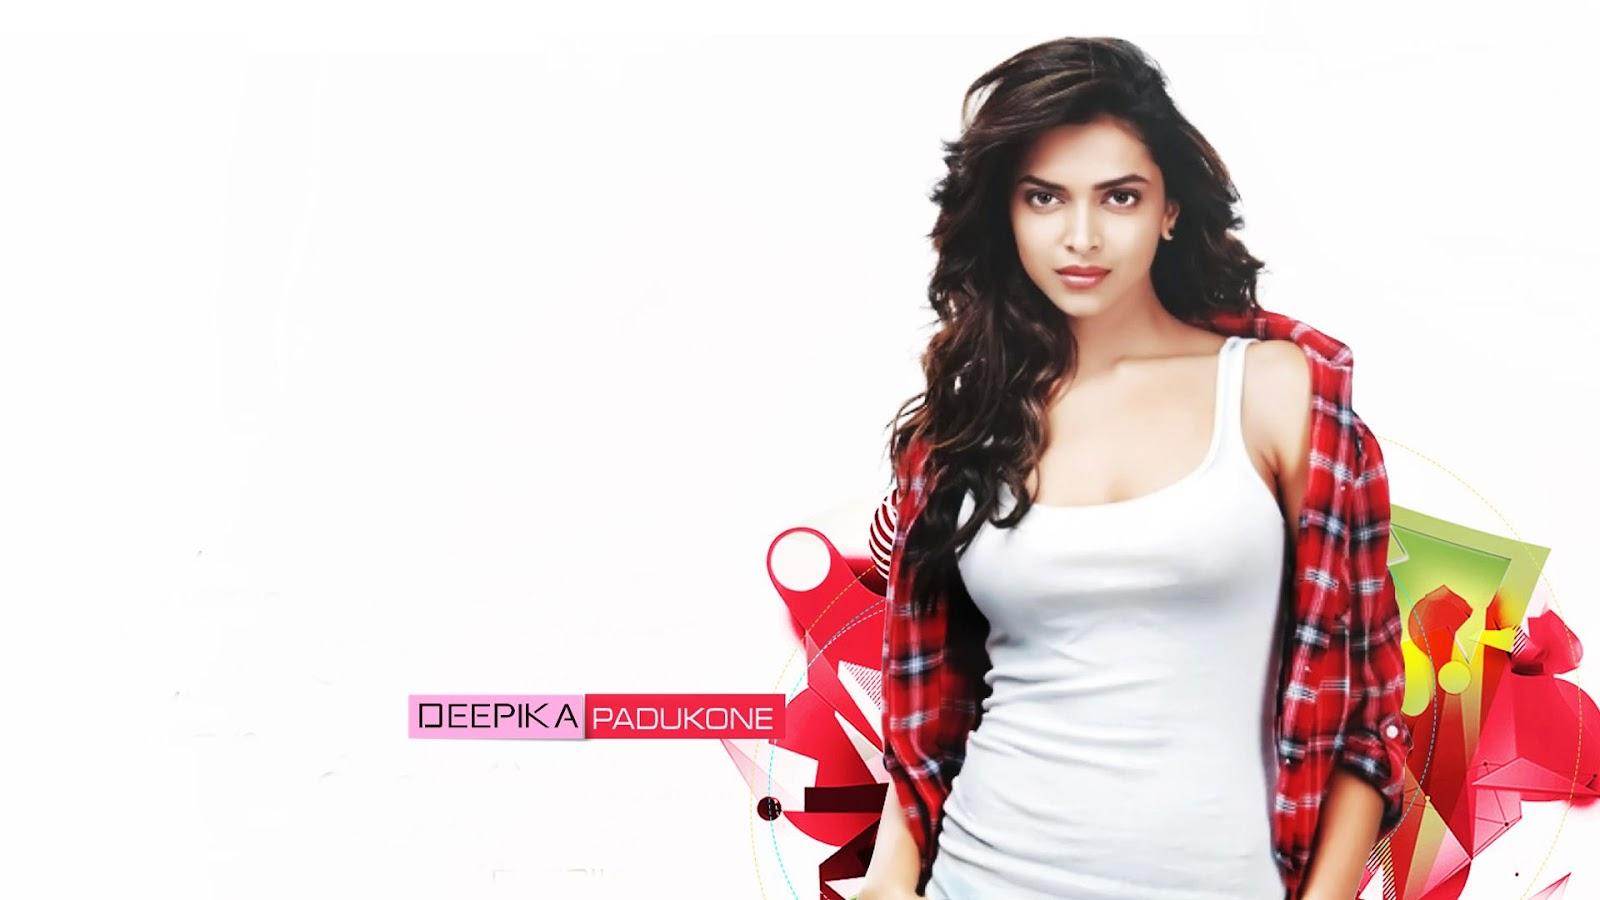 Deepika From Padmavat Hd Wallpaper: Deepika Padukone Hot & Sexy HD Wallpaper